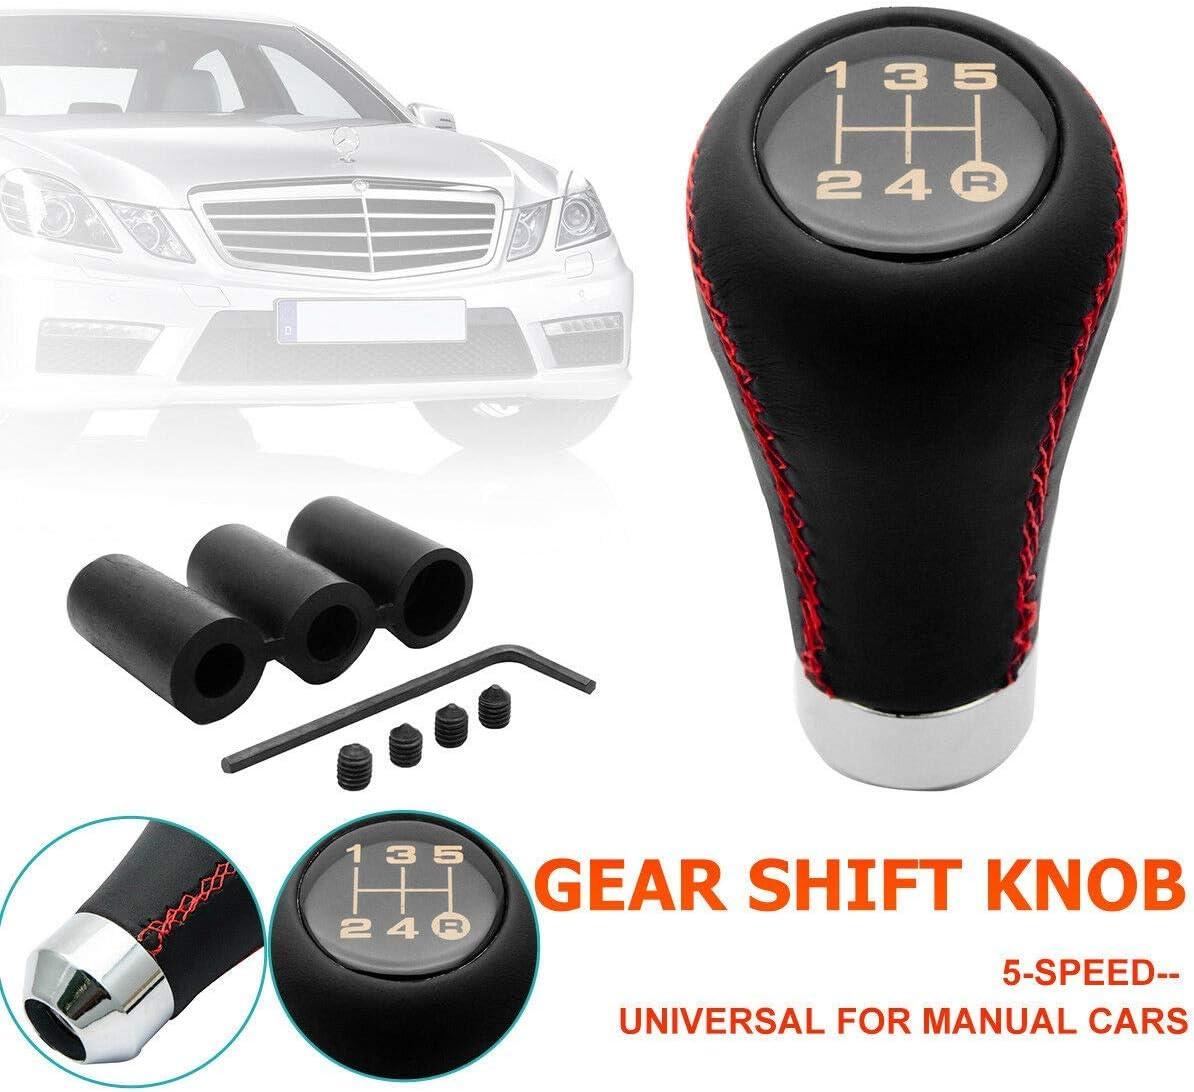 MACHSWON 5 Speed Leather Universal Gear Shift Knob Manual Car ...